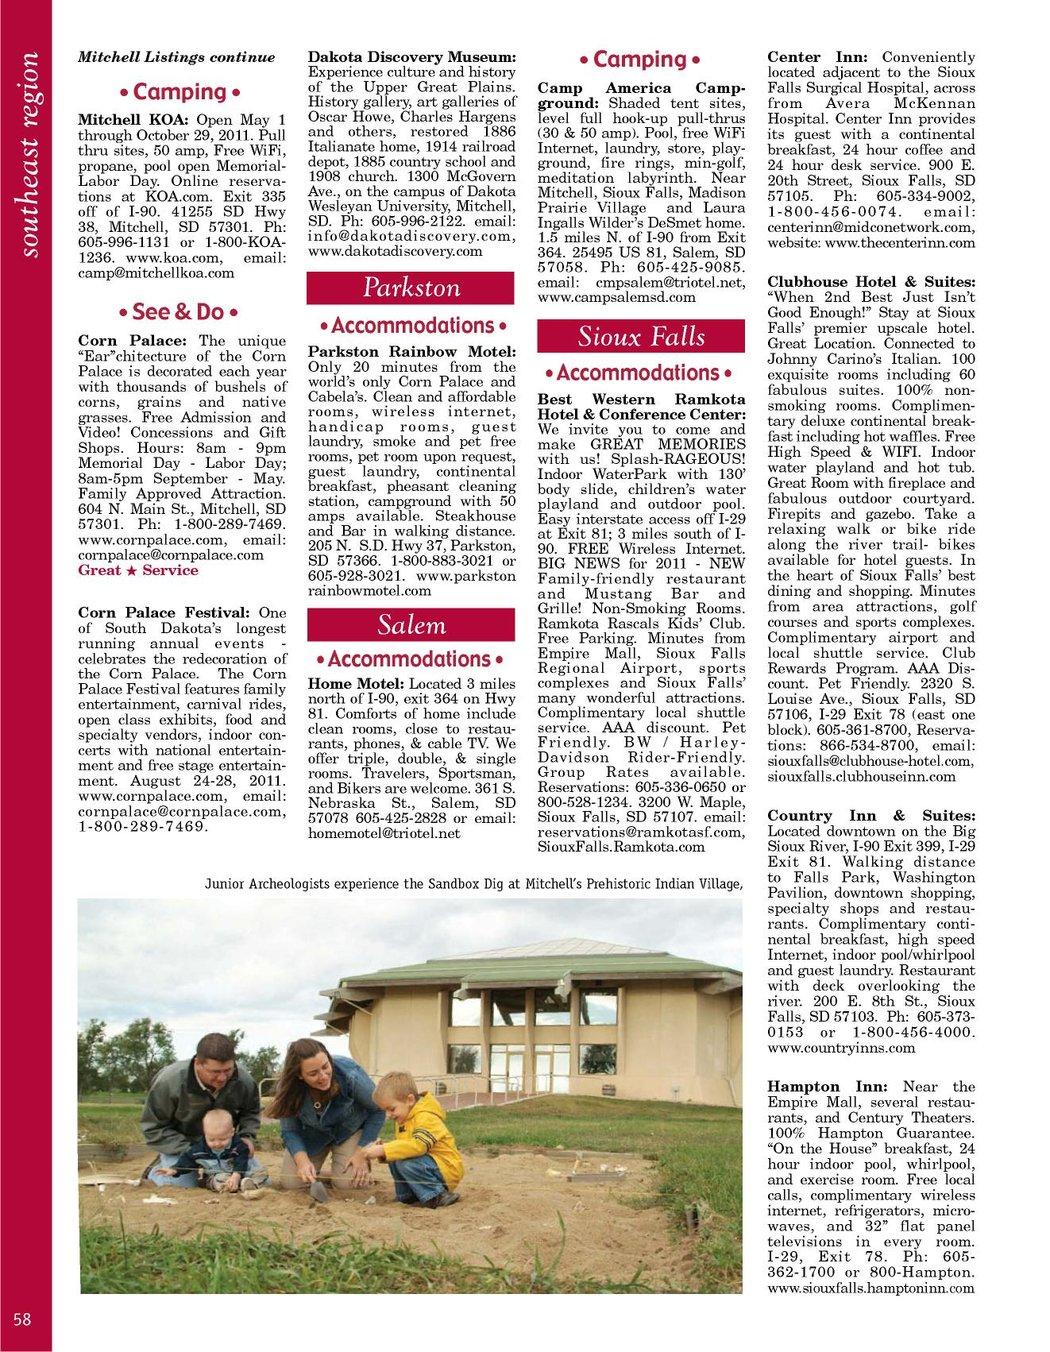 South Dakota Vacation Guide 2011